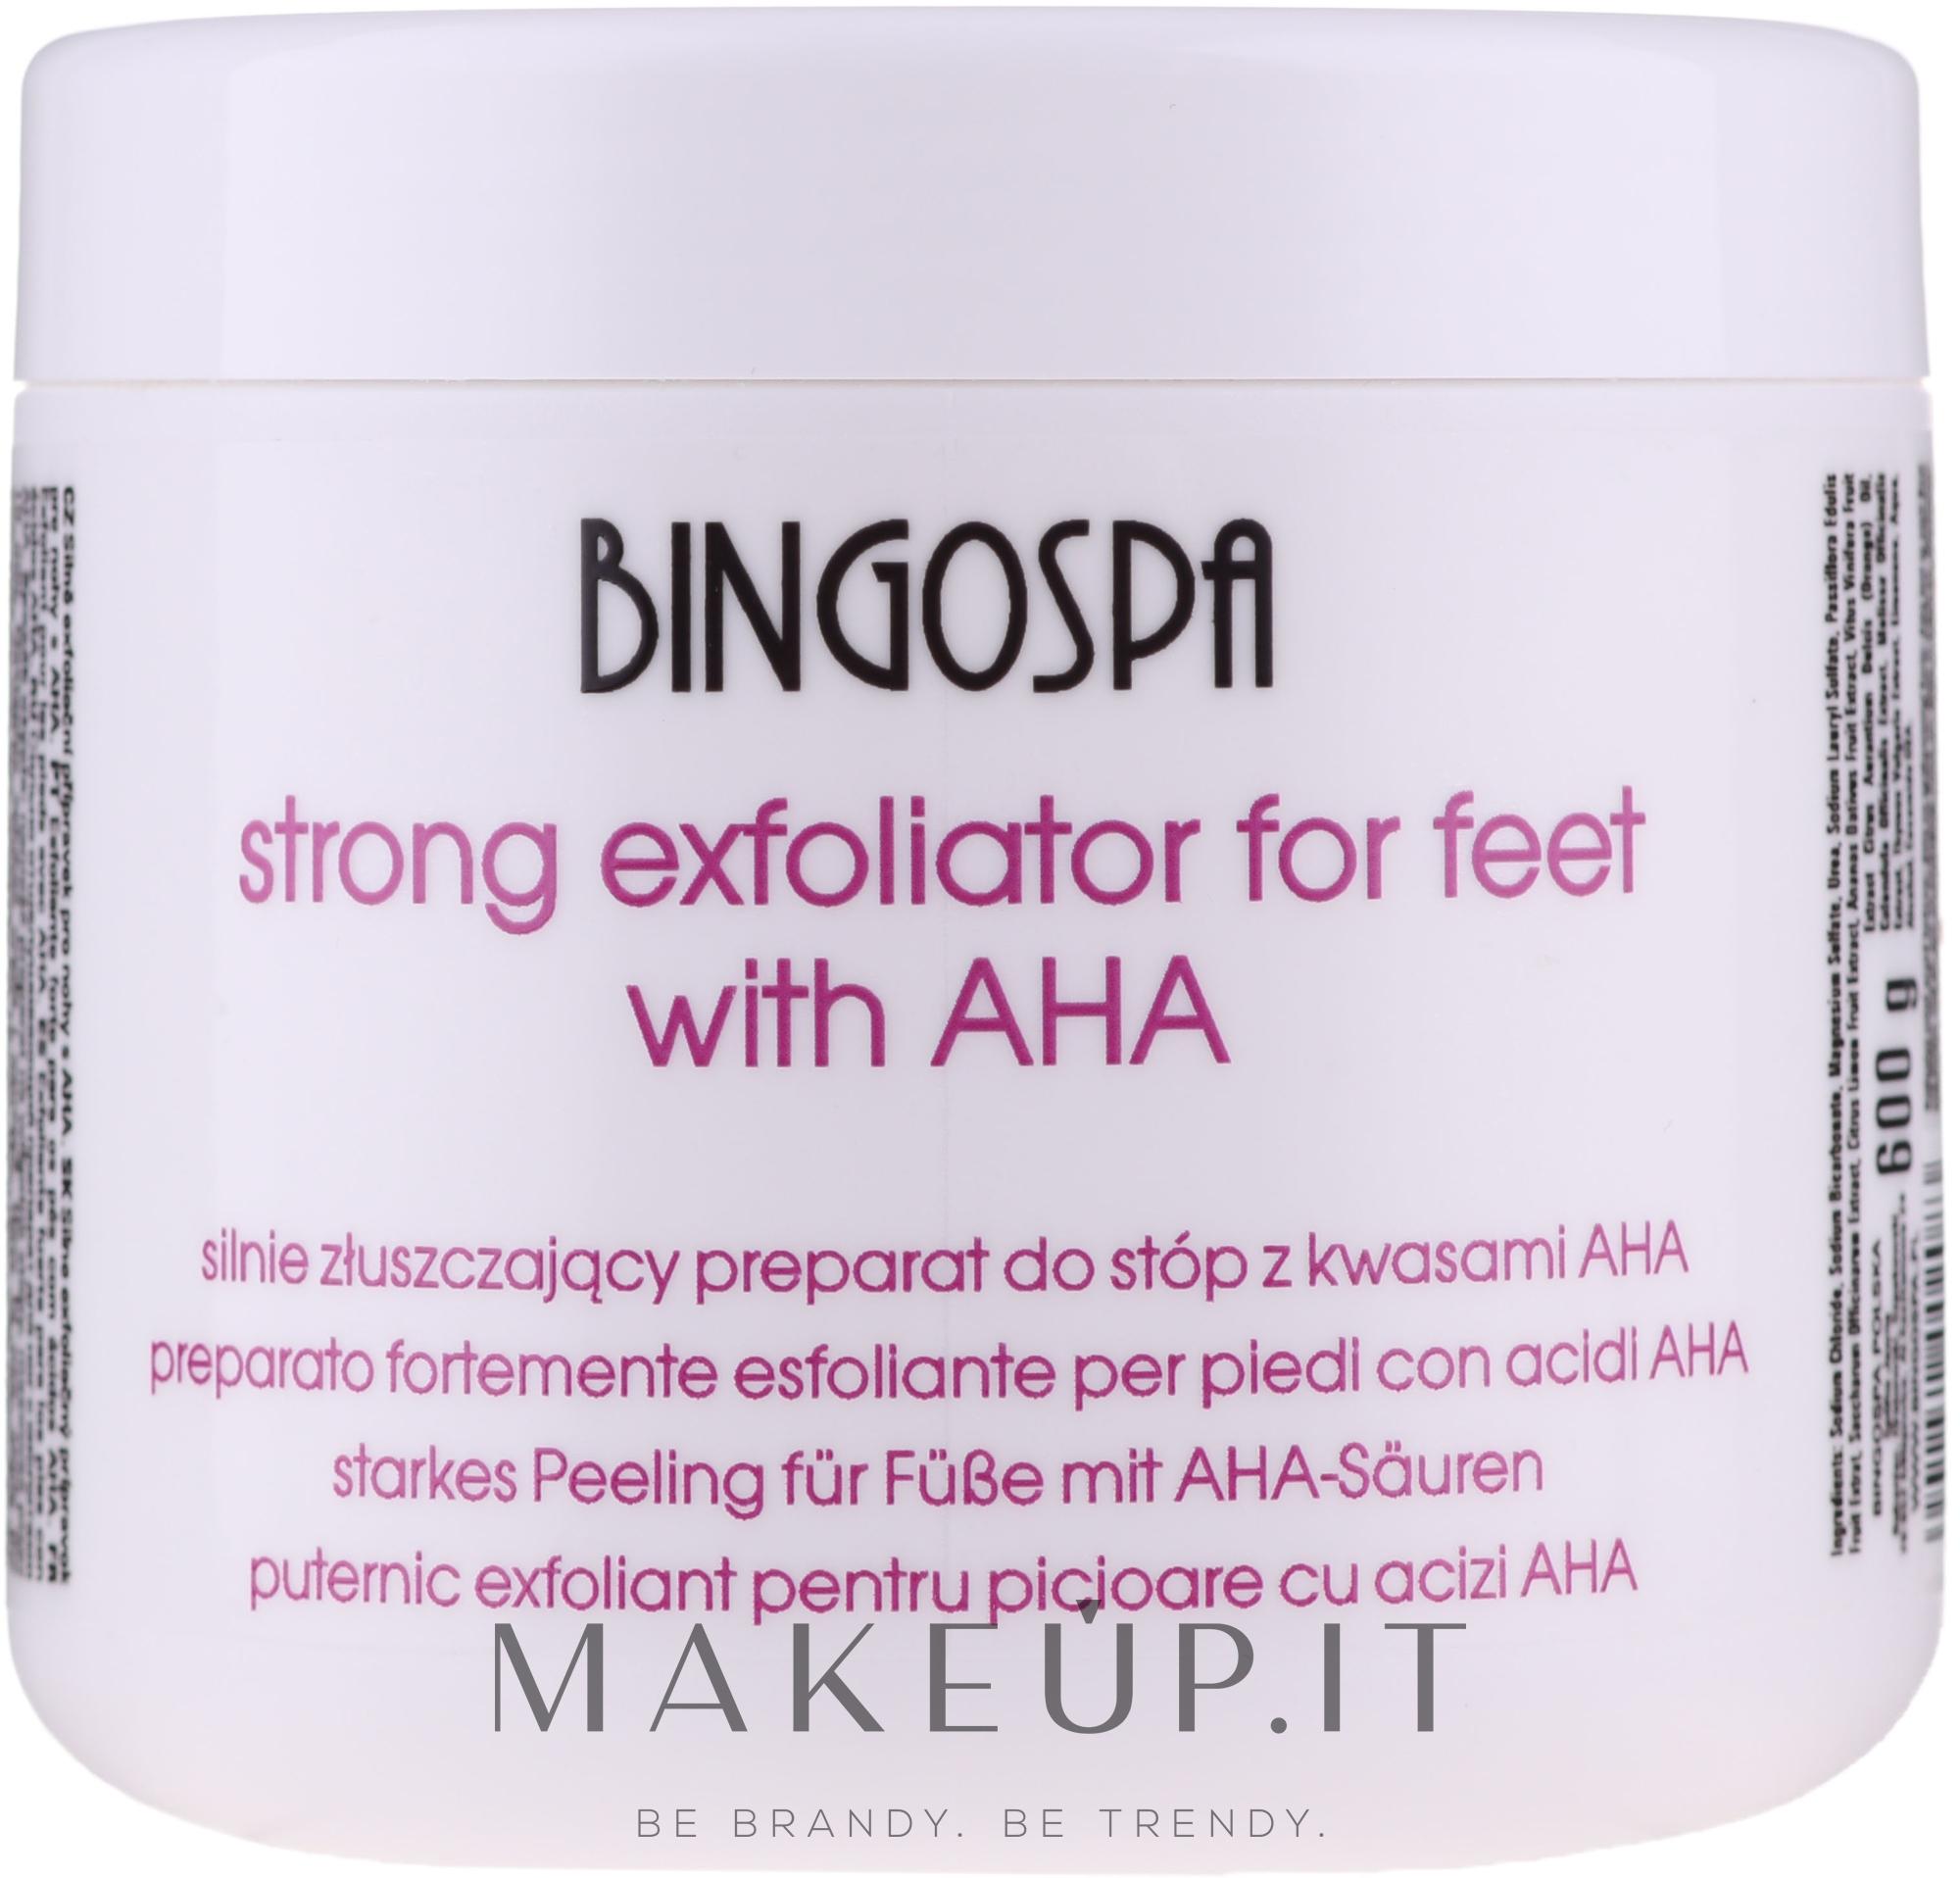 Esfoliante potente per piedi - BingoSpa Strong Exfoliant for Feet with AHA — foto 600 g